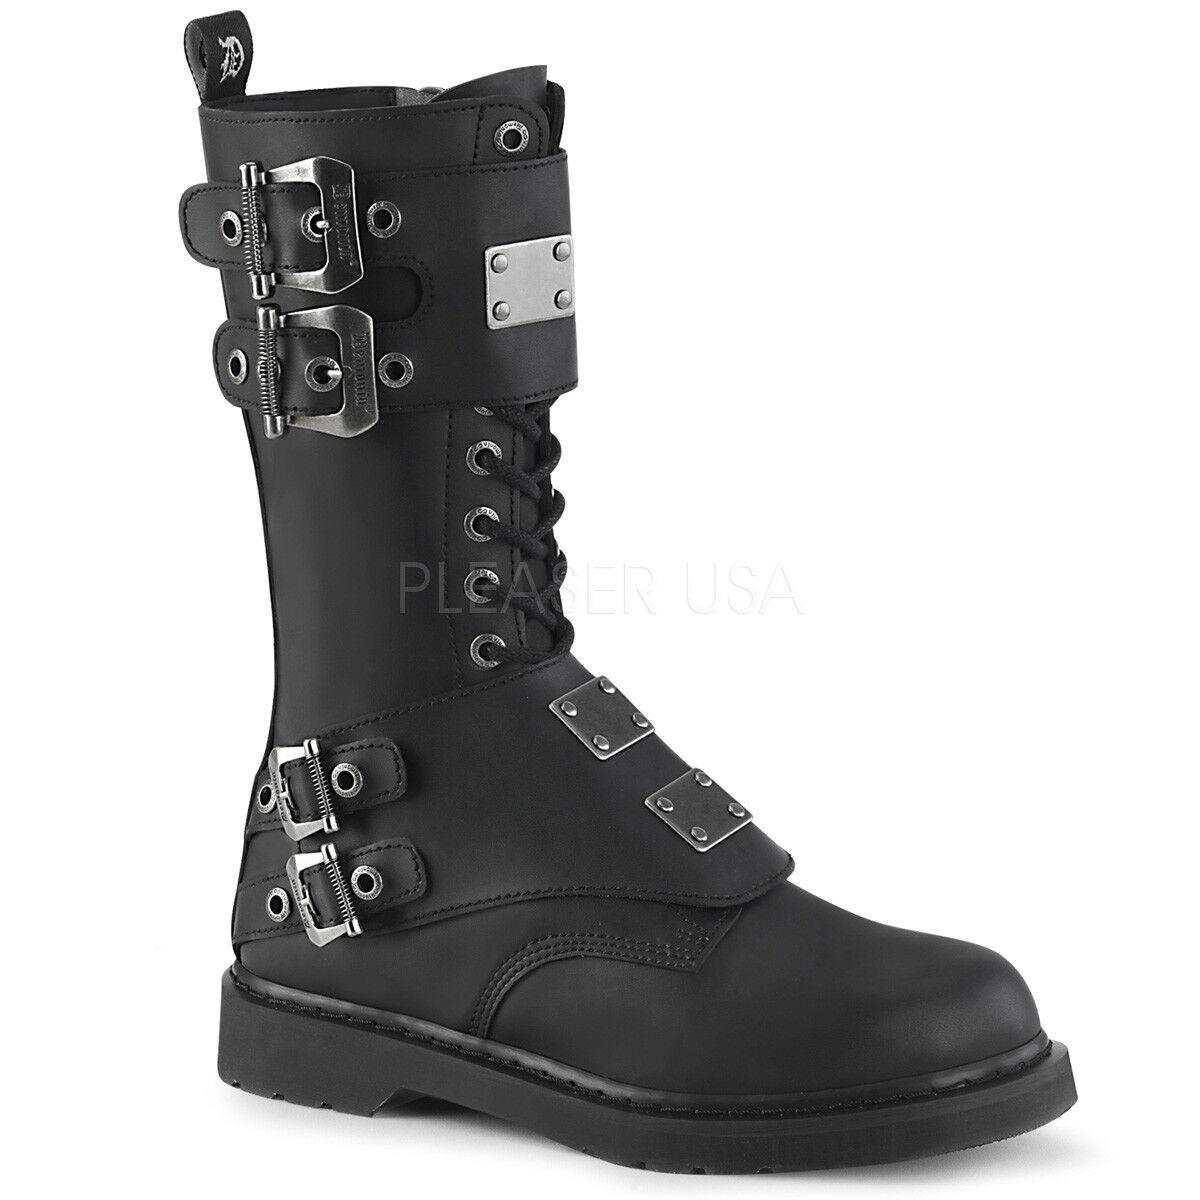 DEMONIA Mens Punk Combat 1 1 4  Heel 14 Eyelet Steel Plate Panels Mid Calf Boots